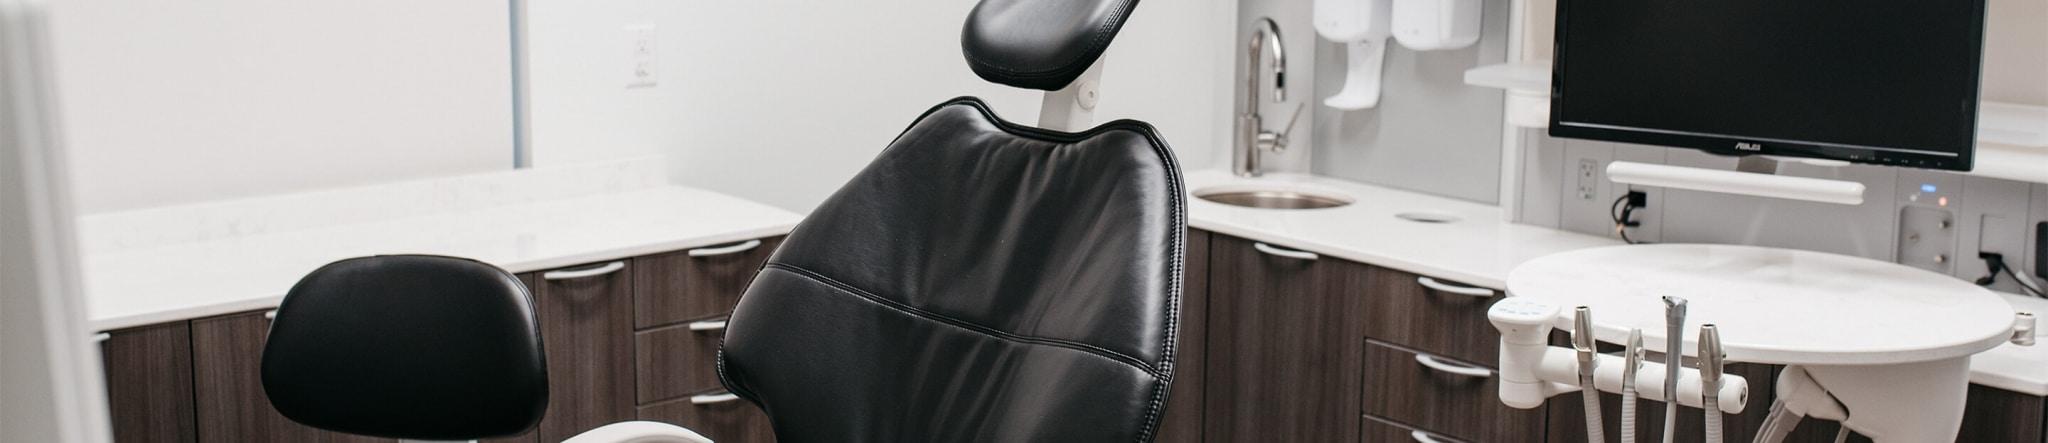 Dental operatory at NOVO Dental Centre